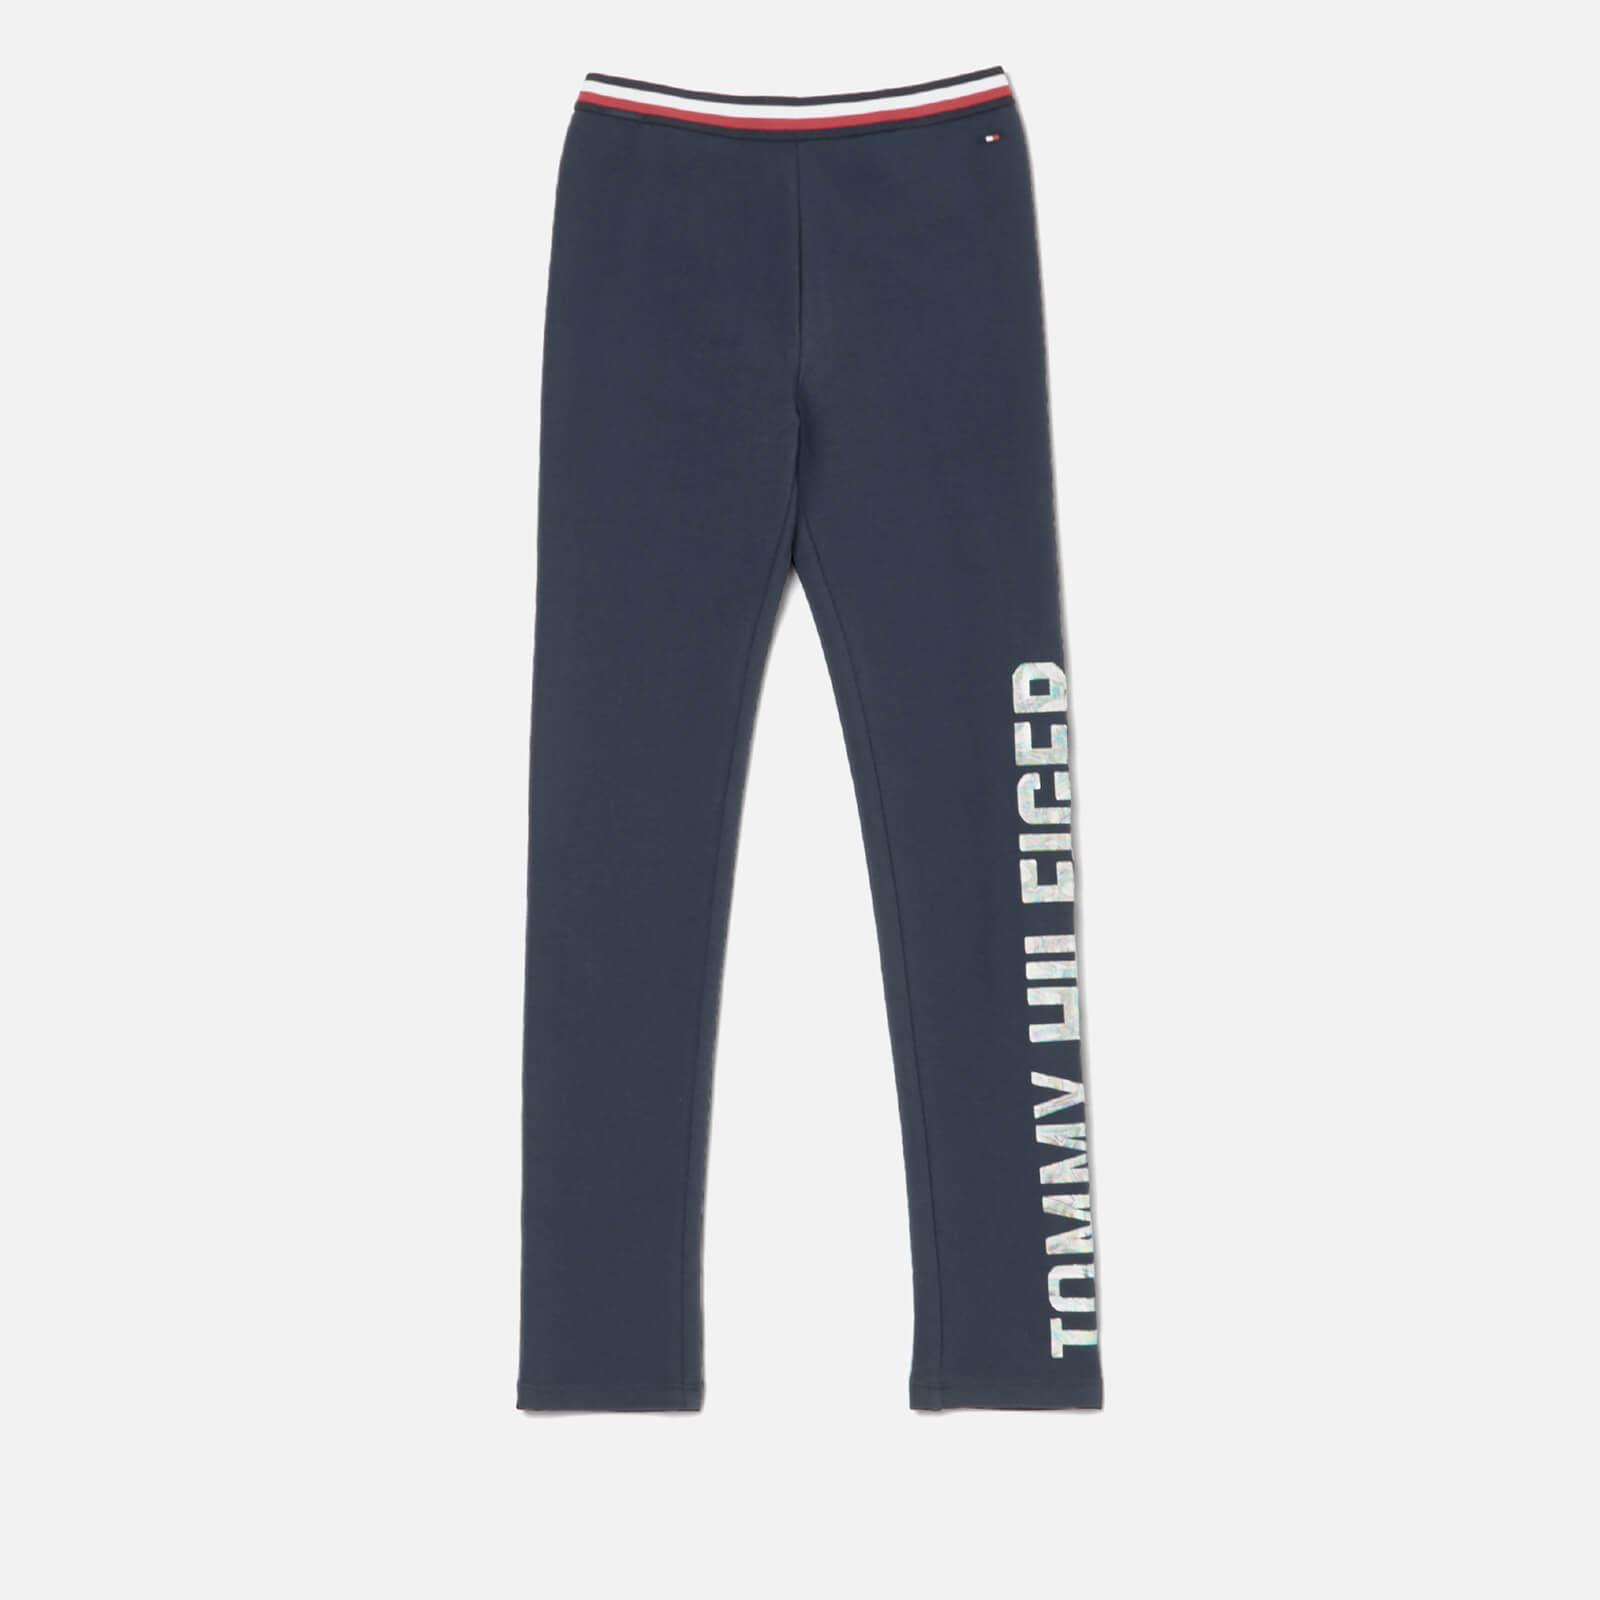 Tommy Hilfiger Girls' Essential Logo Legging - Black Iris - 10 Years - Blue